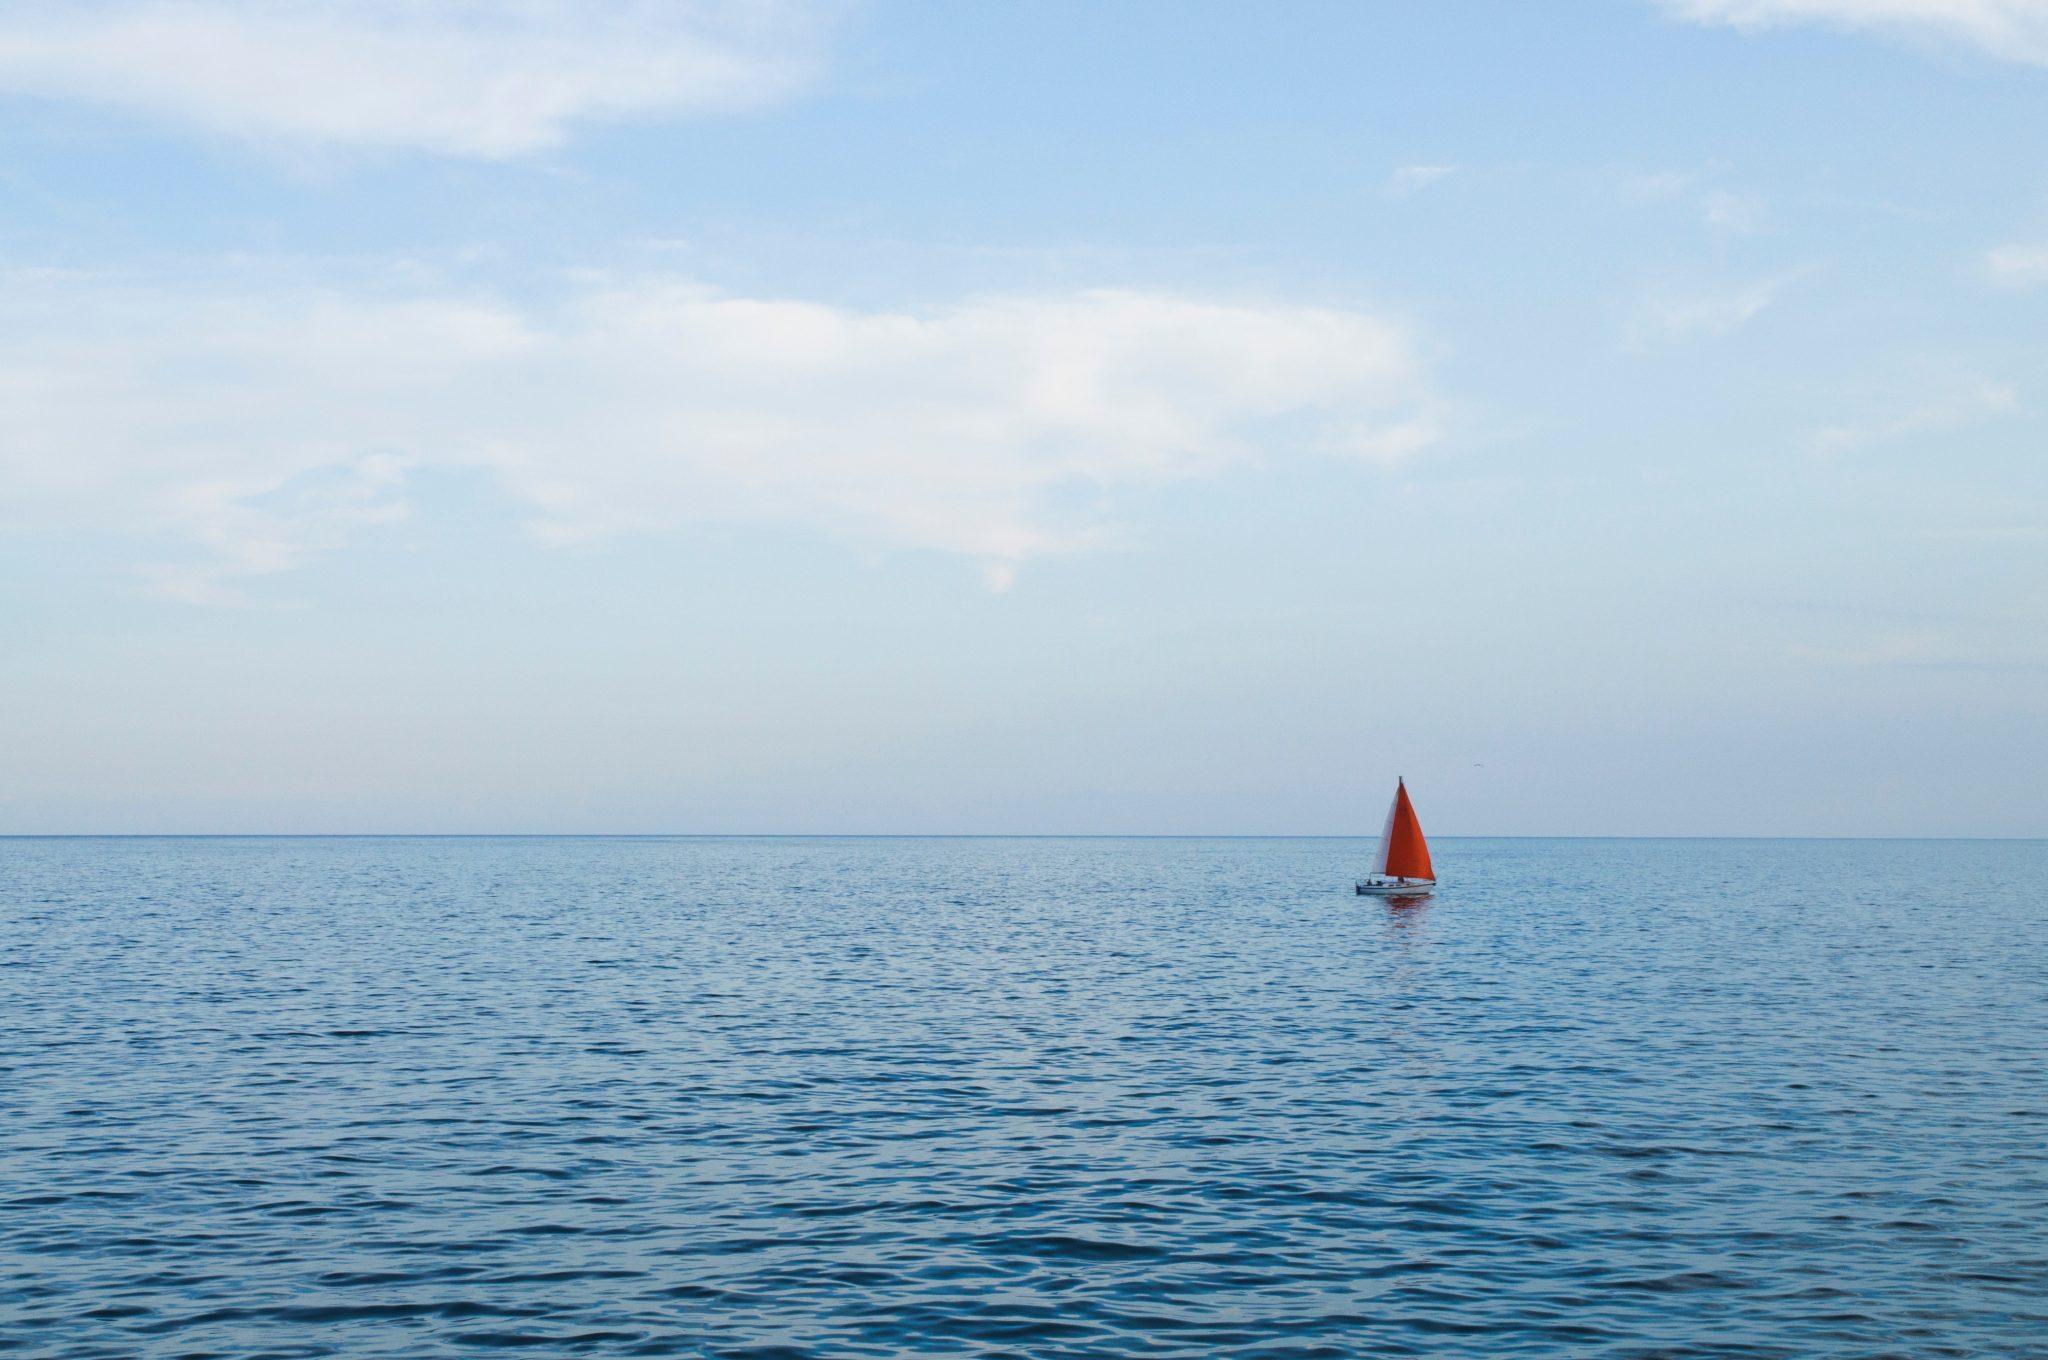 Destin Harbor Private Sailing Excursion